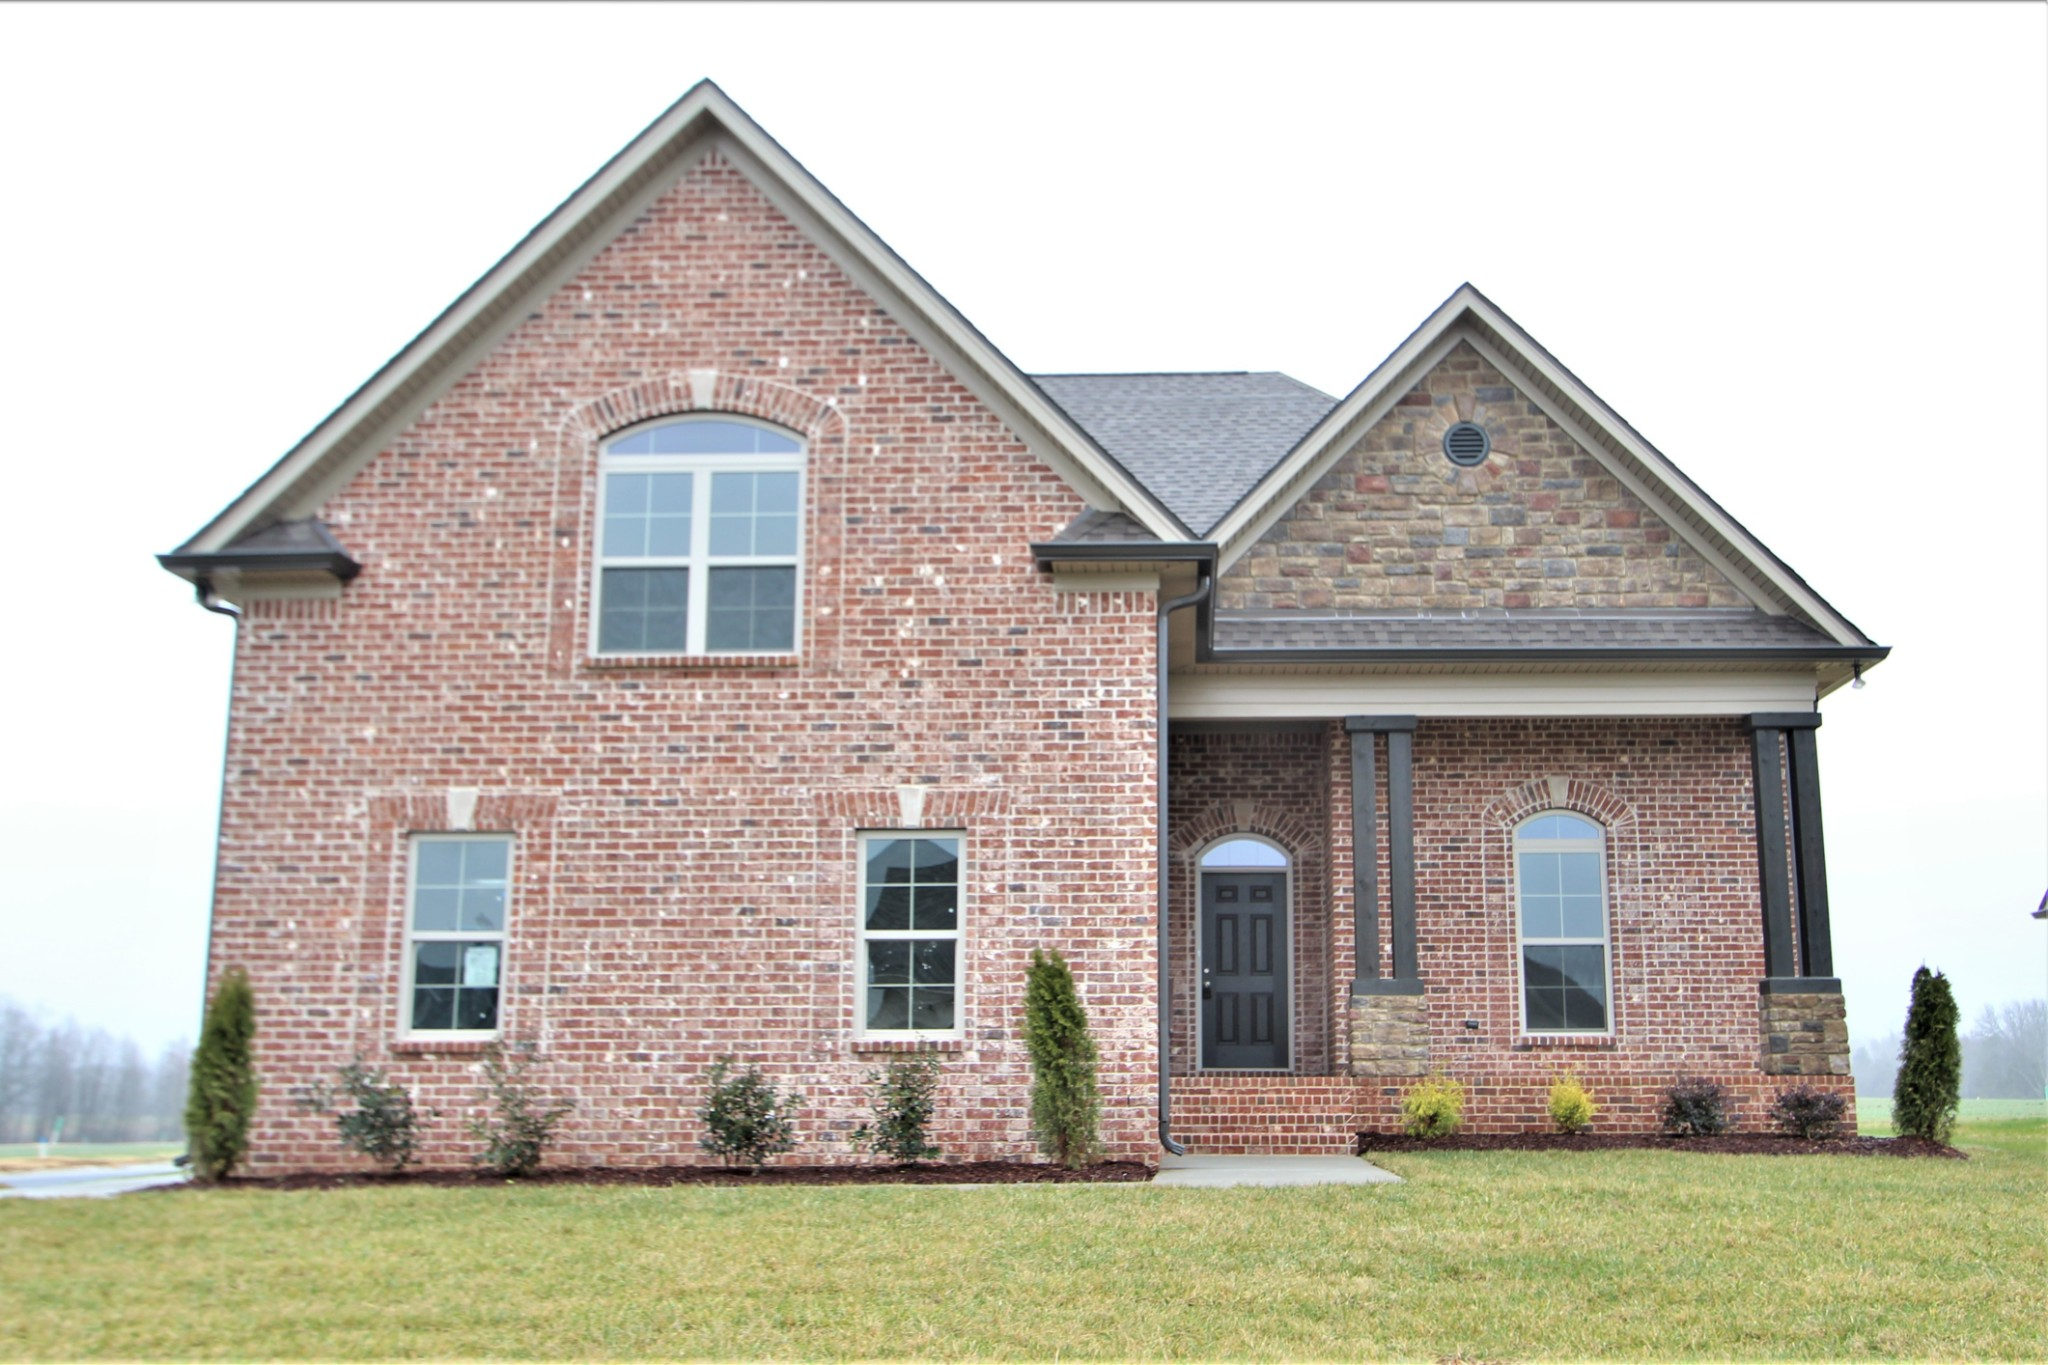 552 Dexter Drive #34-C, Clarksville, TN 37043 - Clarksville, TN real estate listing